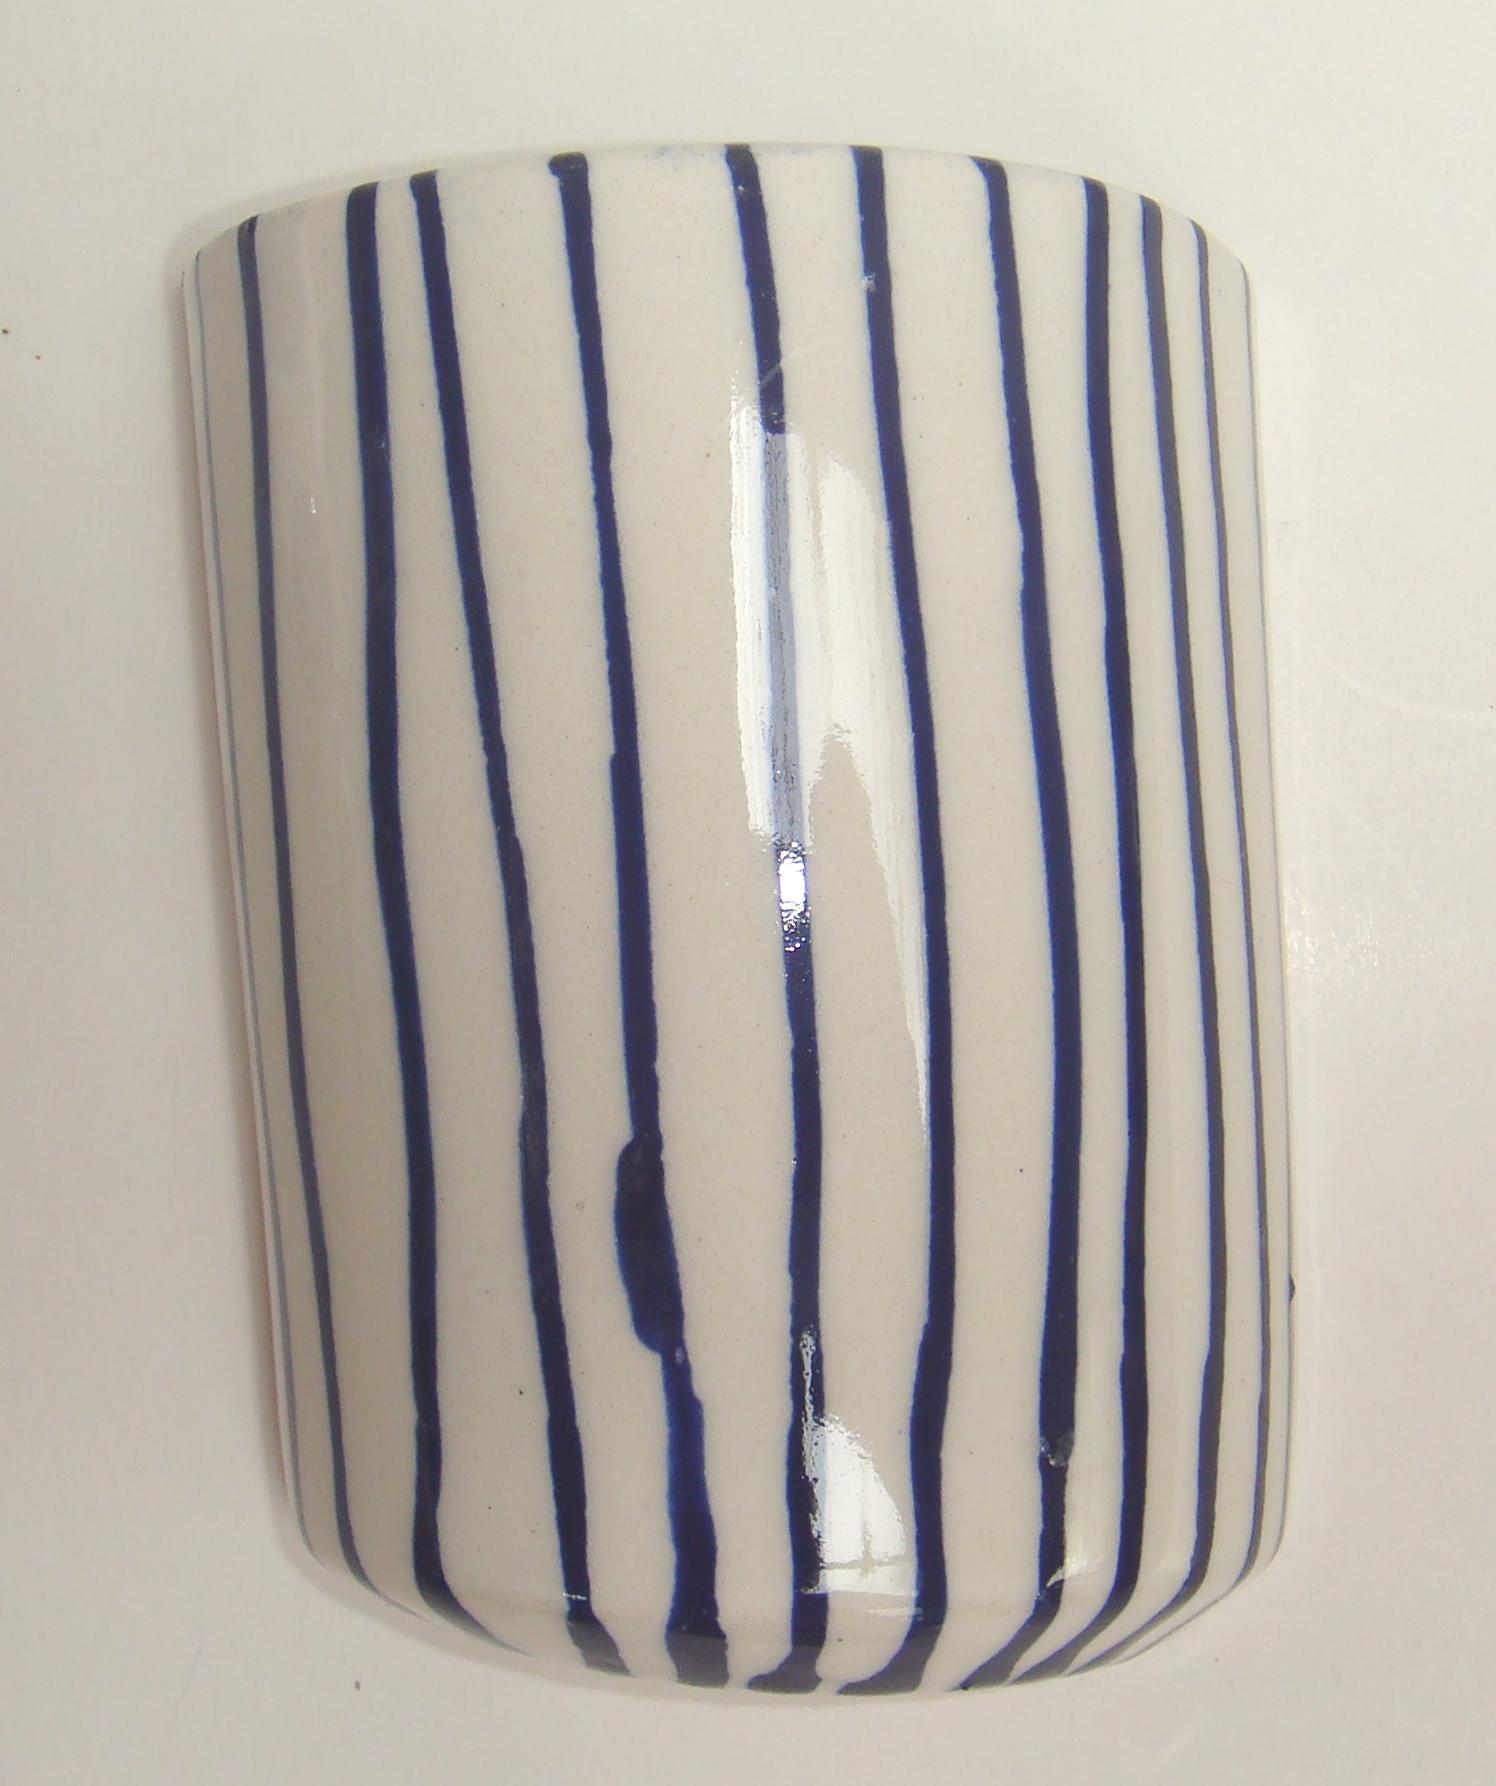 BLU-017 Half Vase Thin Stripe